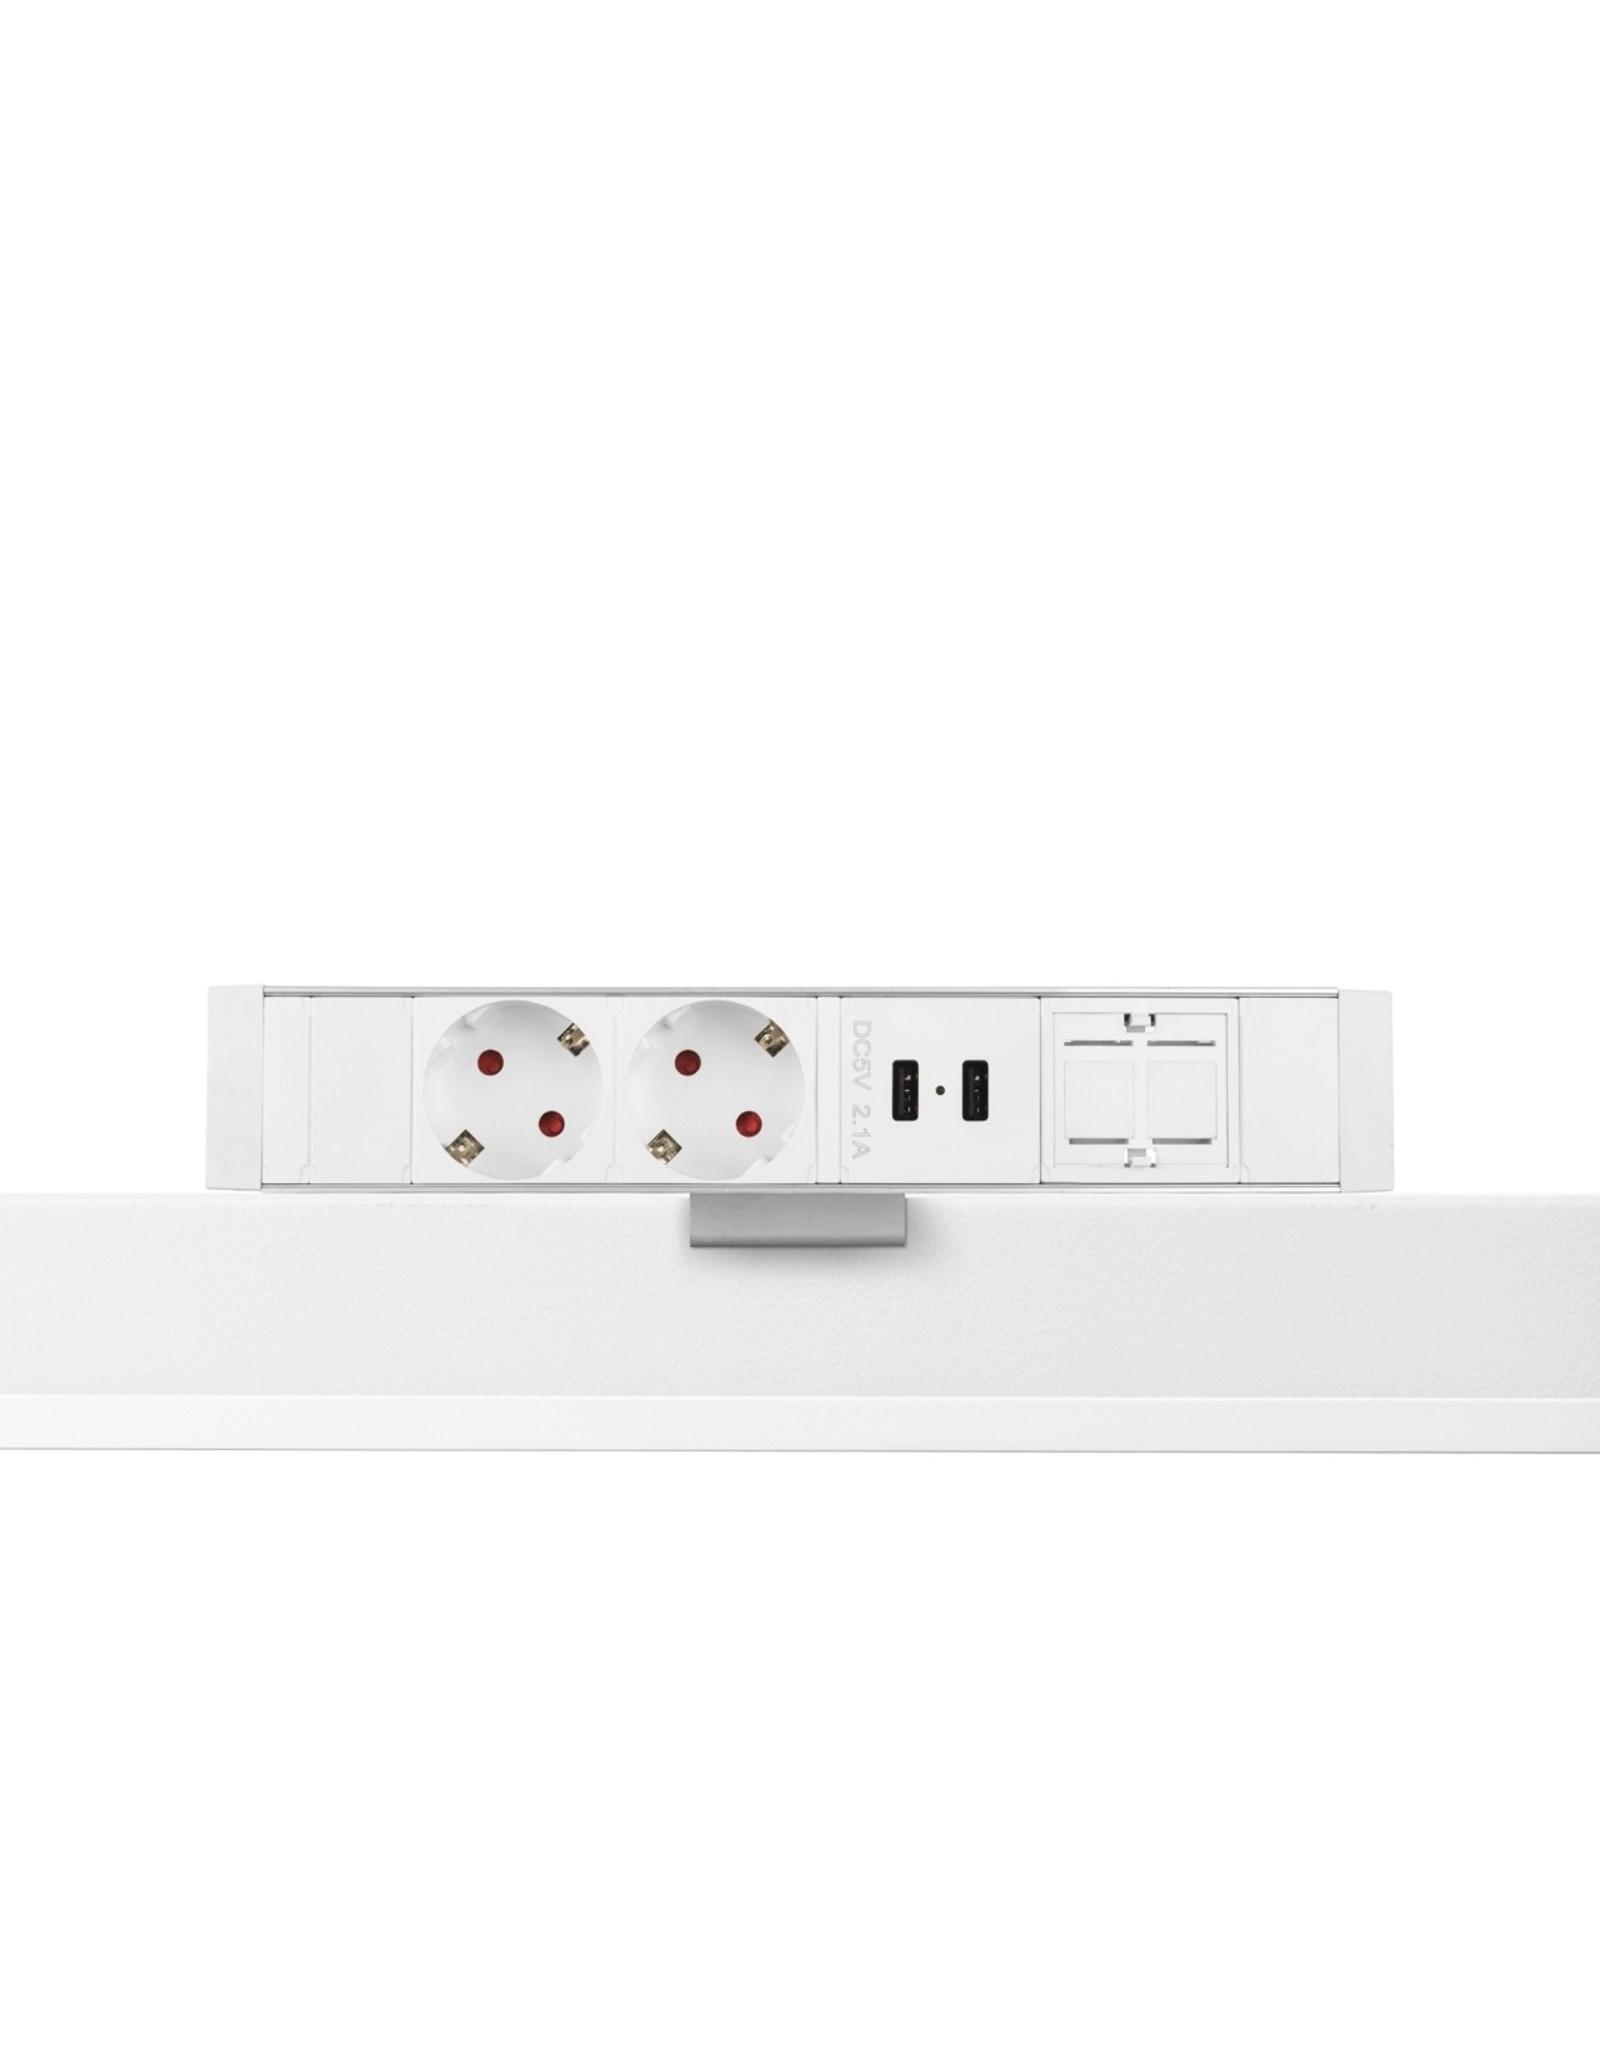 Filex Power Desk up - 2x 230V - 2x USB charger - 1x Keystone